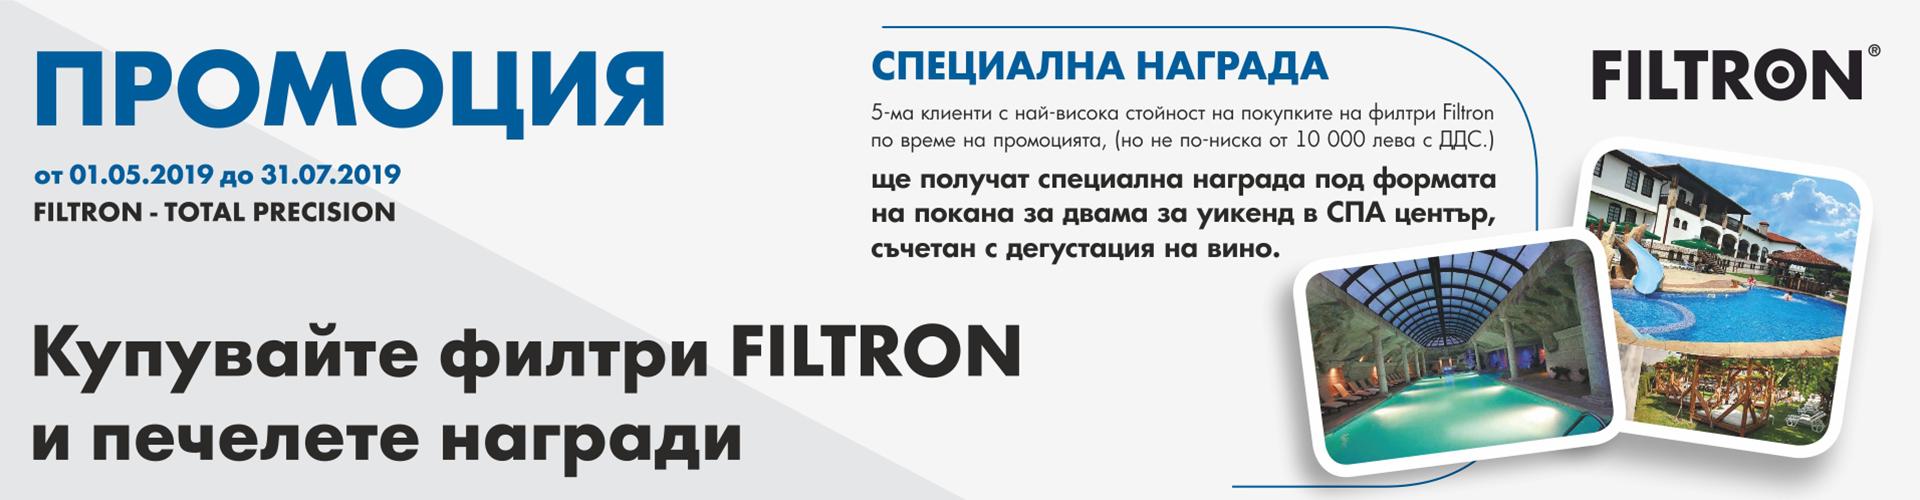 promo_filtron_2019_01.05.2019-31.07.2019_banner.jpg